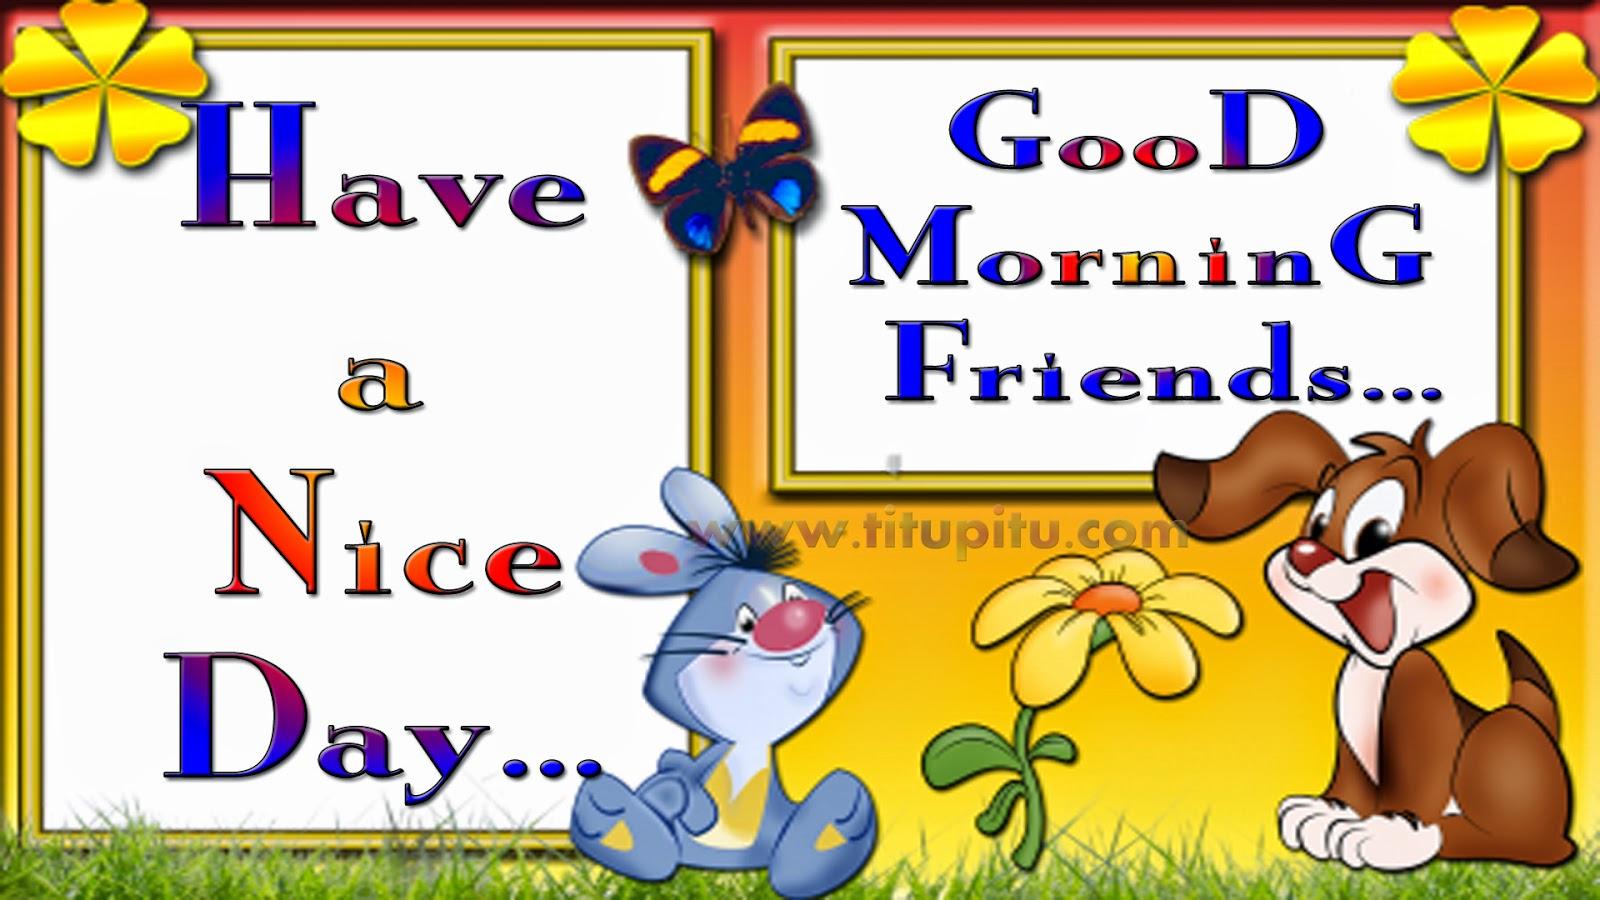 Wallpaper download jokes - Good Morning Wallpapers For Facebook